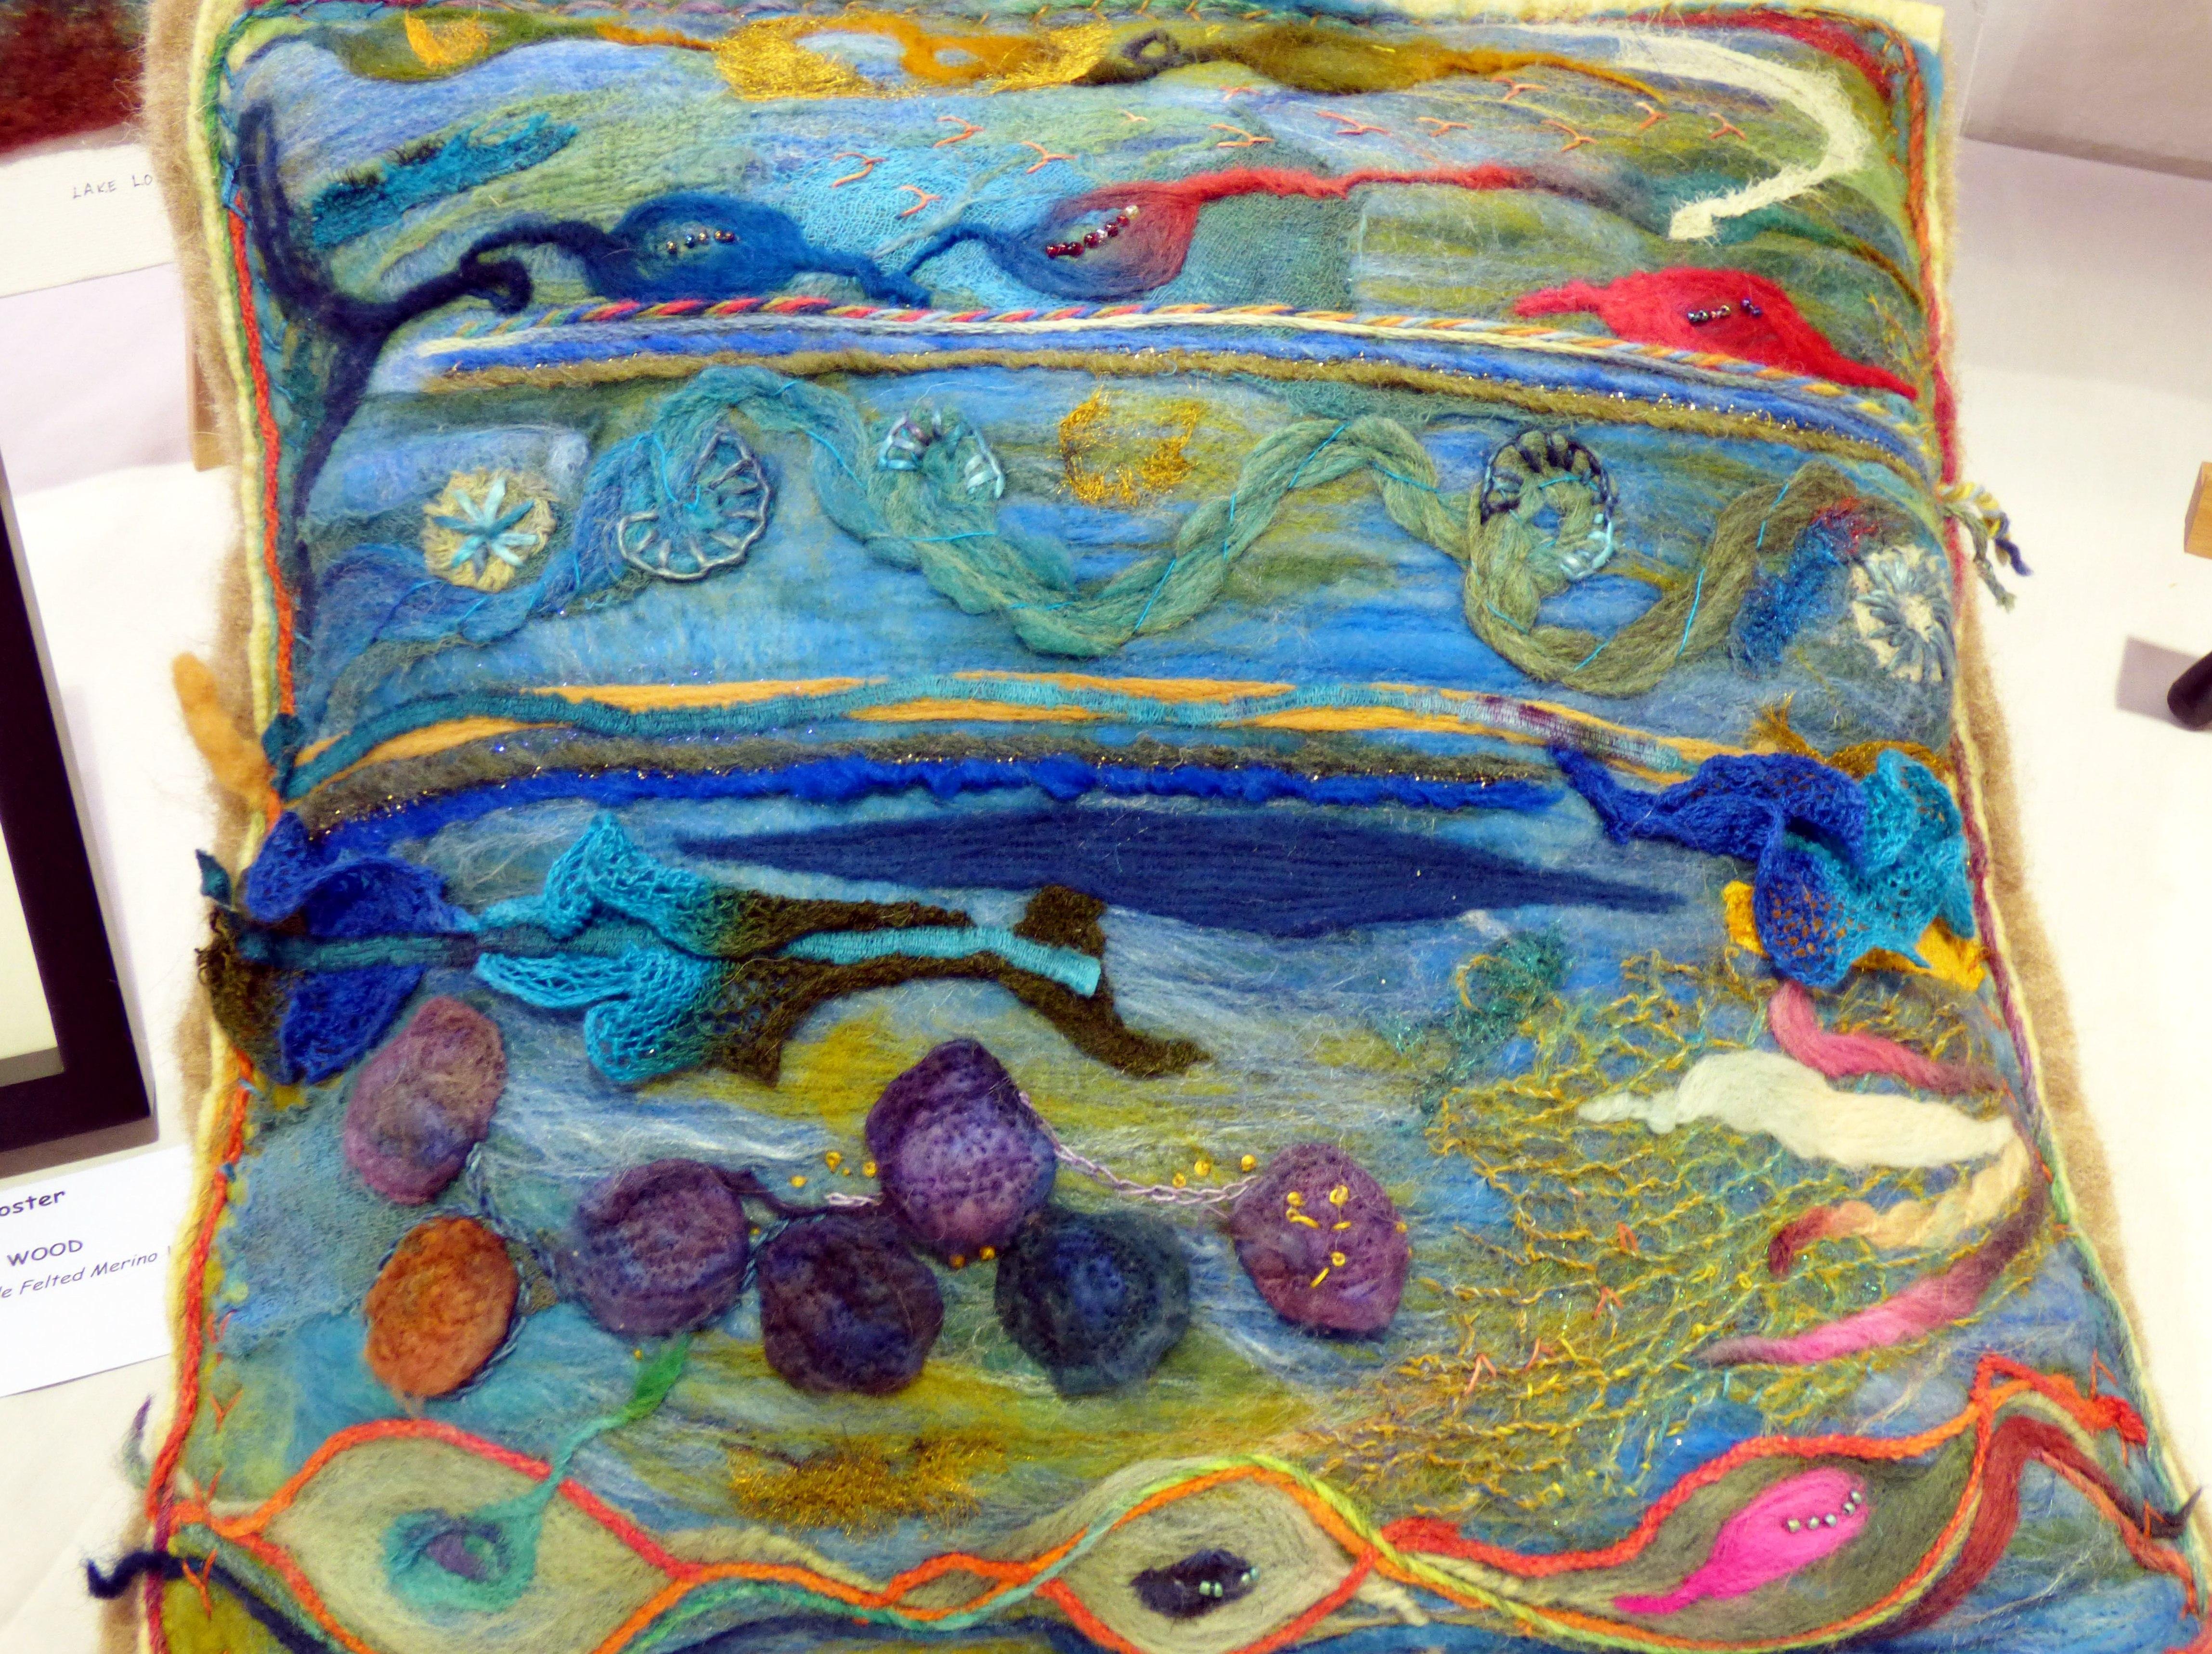 CUSHION COVER by Janine Liggins, N.Wales EG, embellished handmade felt